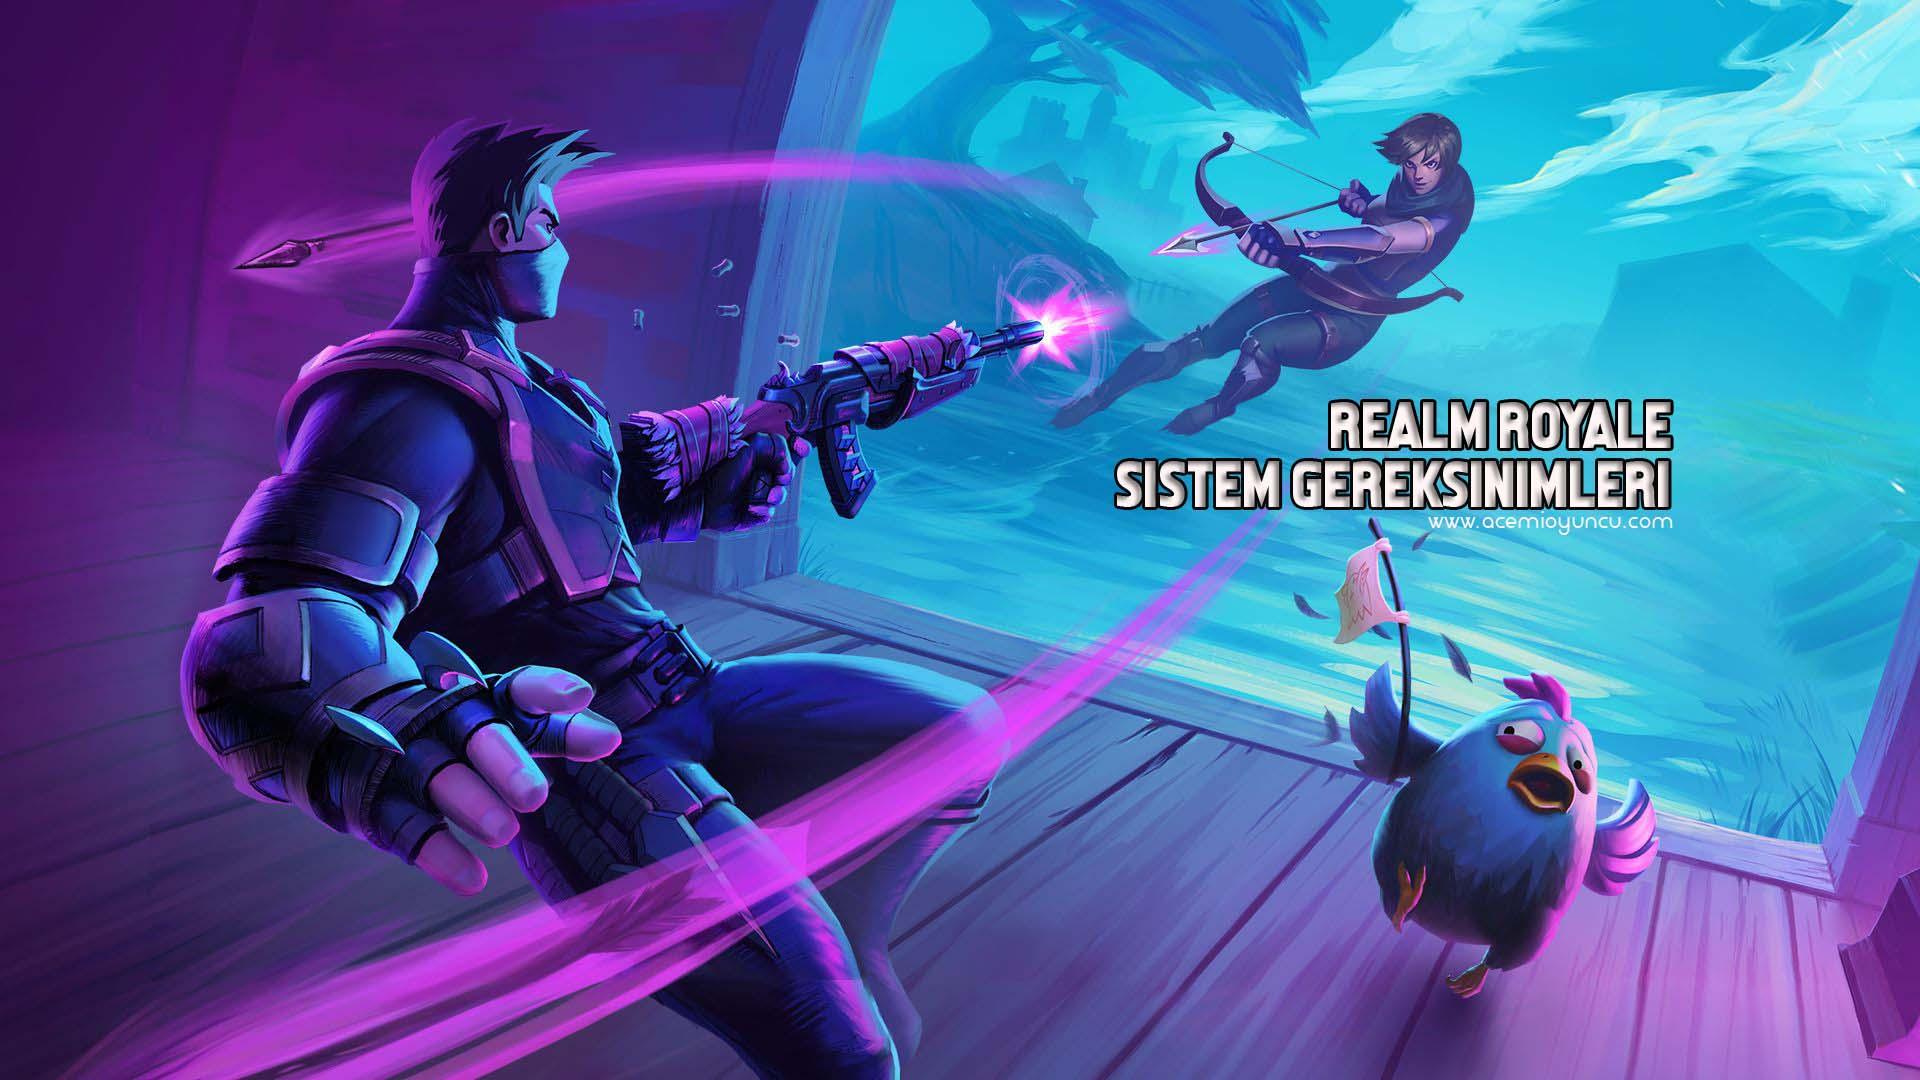 Realm Royale Sistem Gereksinimleri – Realm Royale Kaç GB ?